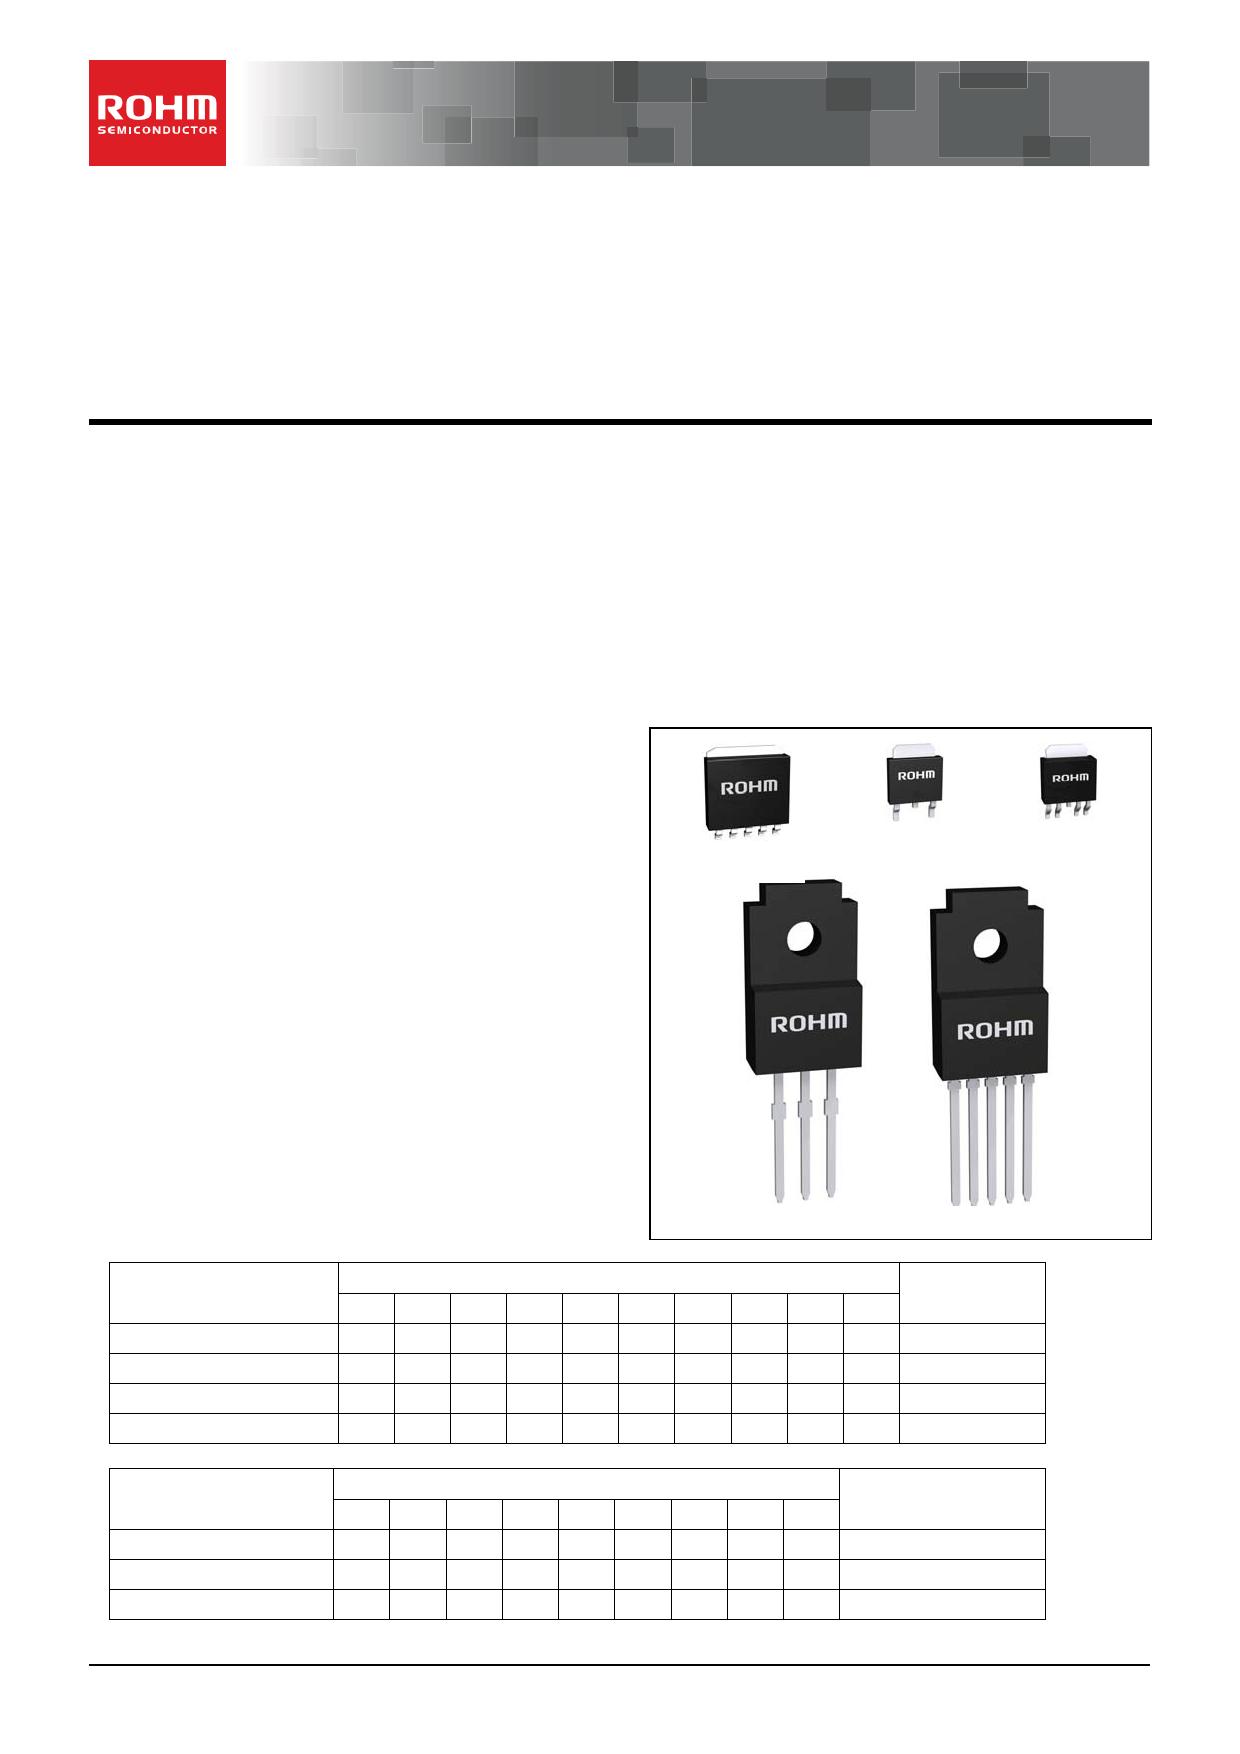 BA05CC0WFP-E2 datasheet